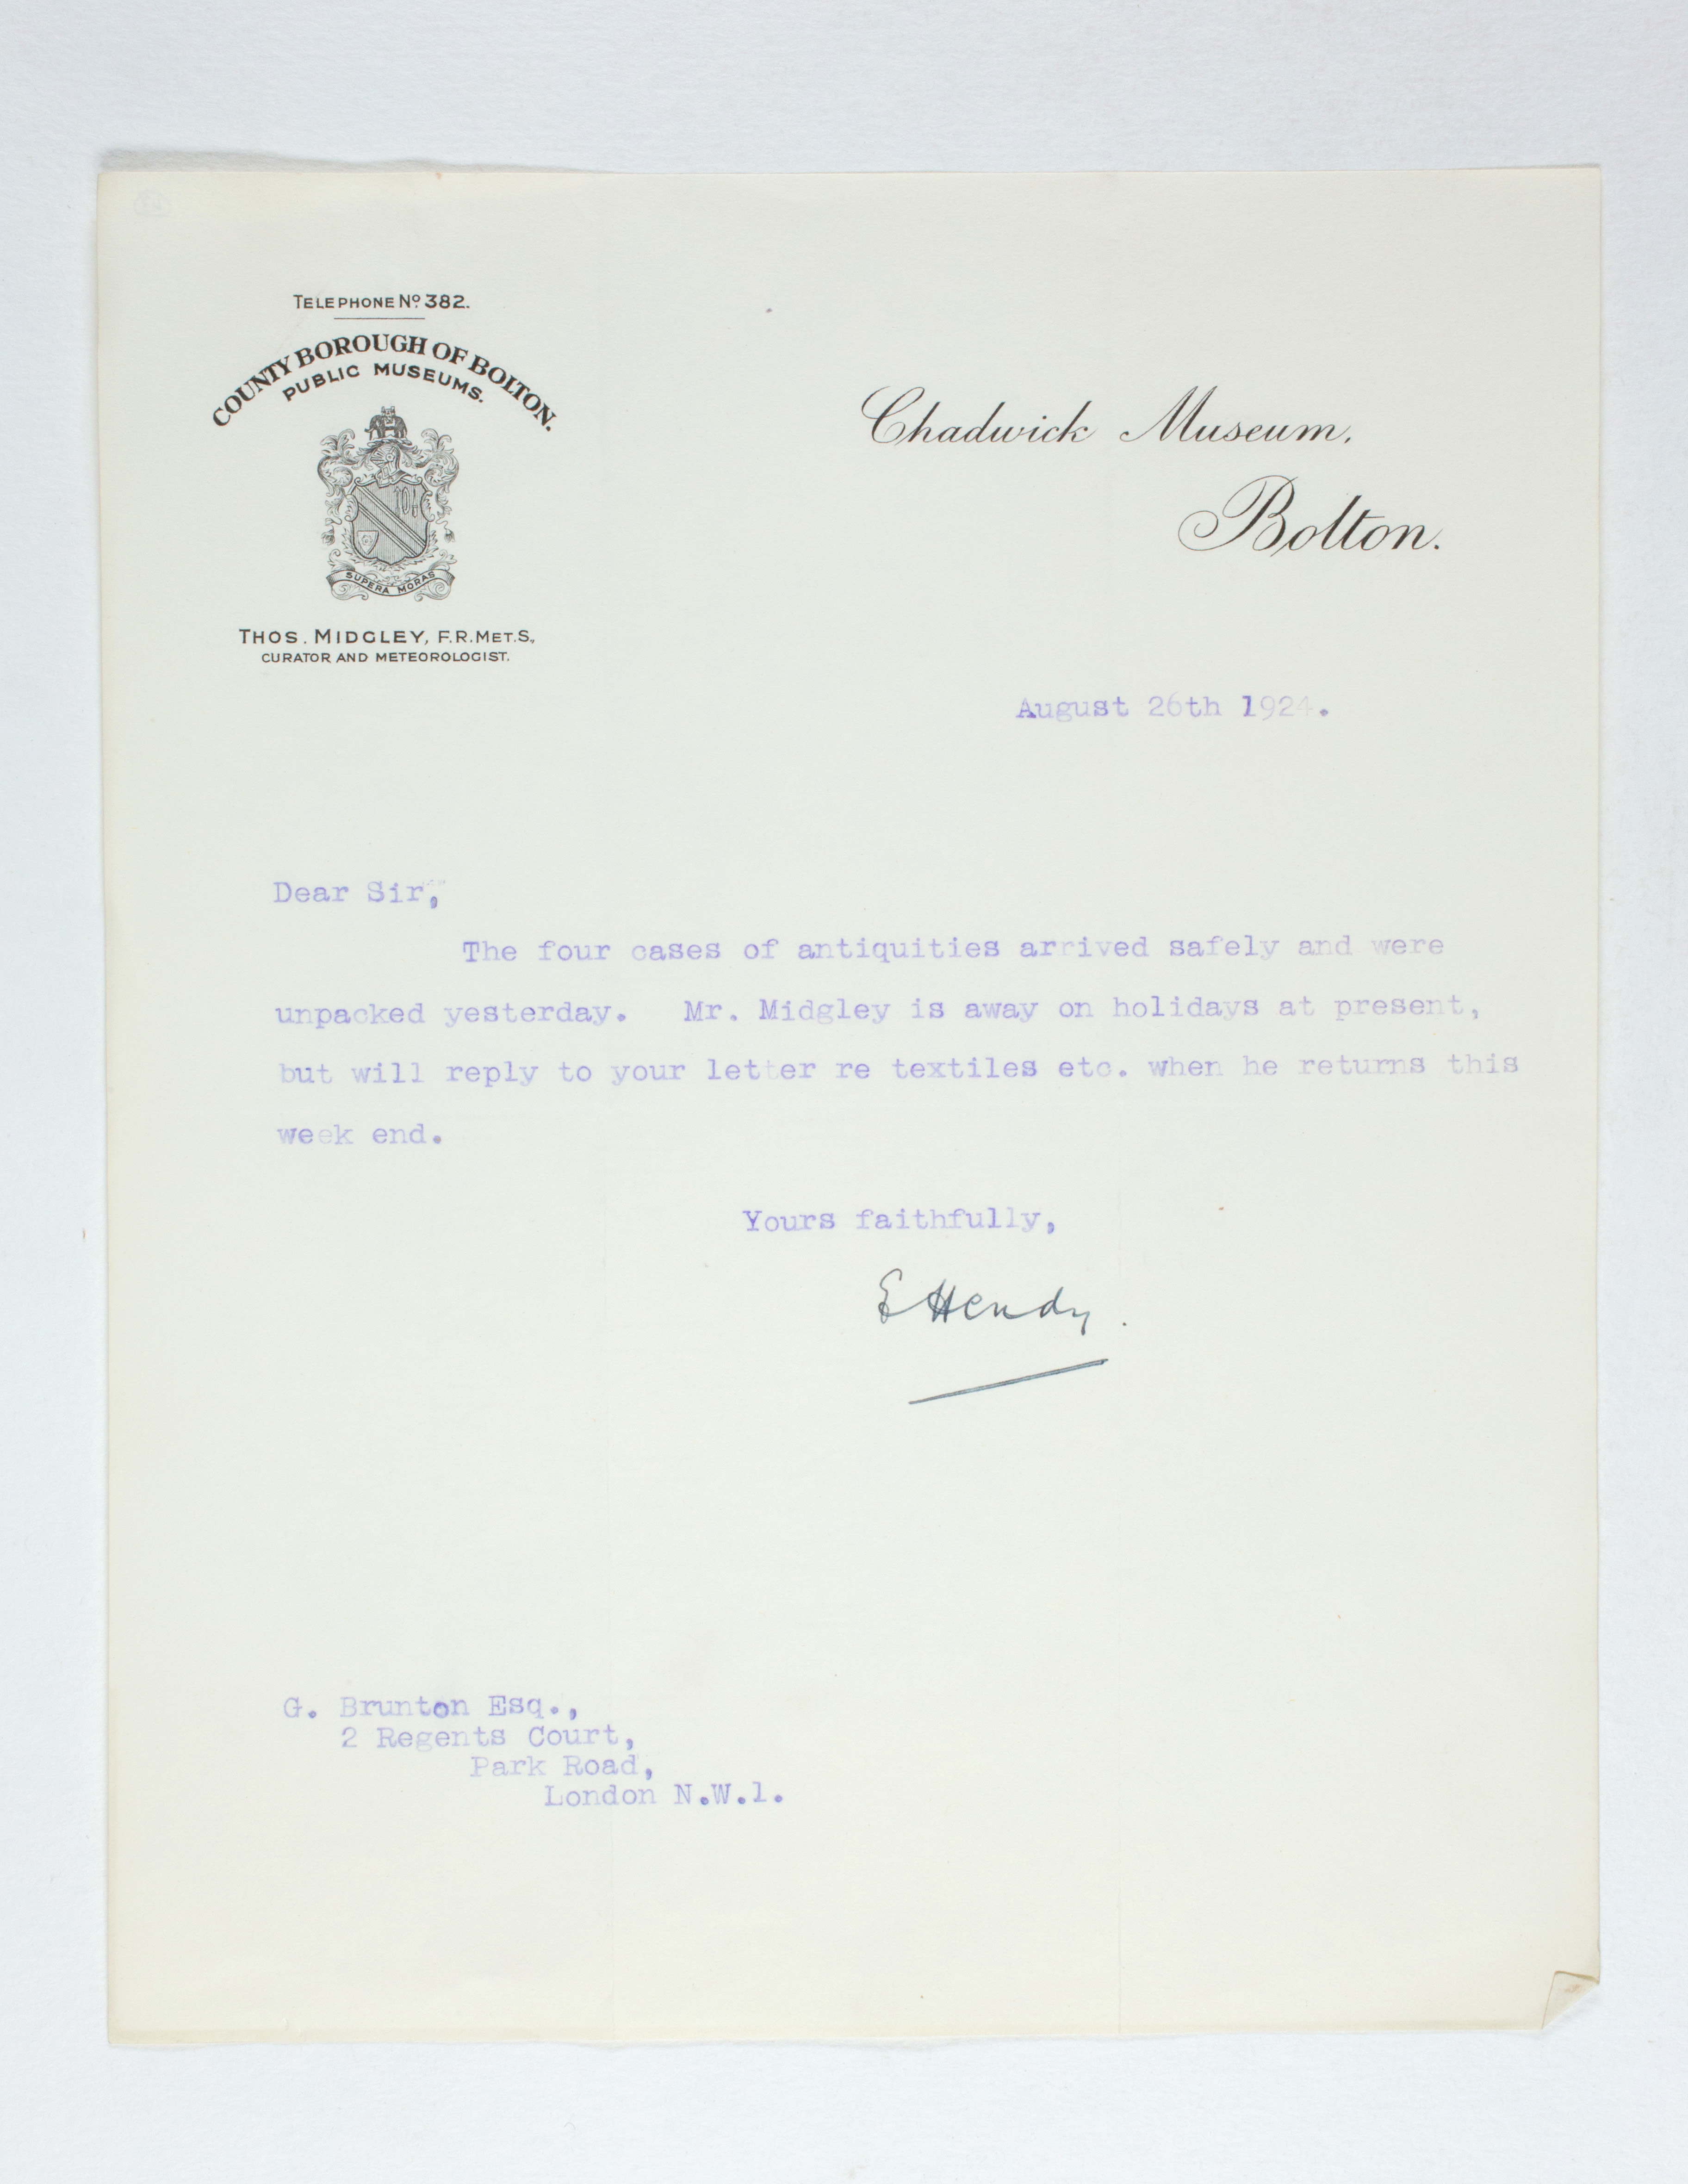 1923-24 Qau el-Kebir, Hemamieh Correspondence PMA/WFP1/D/27/43